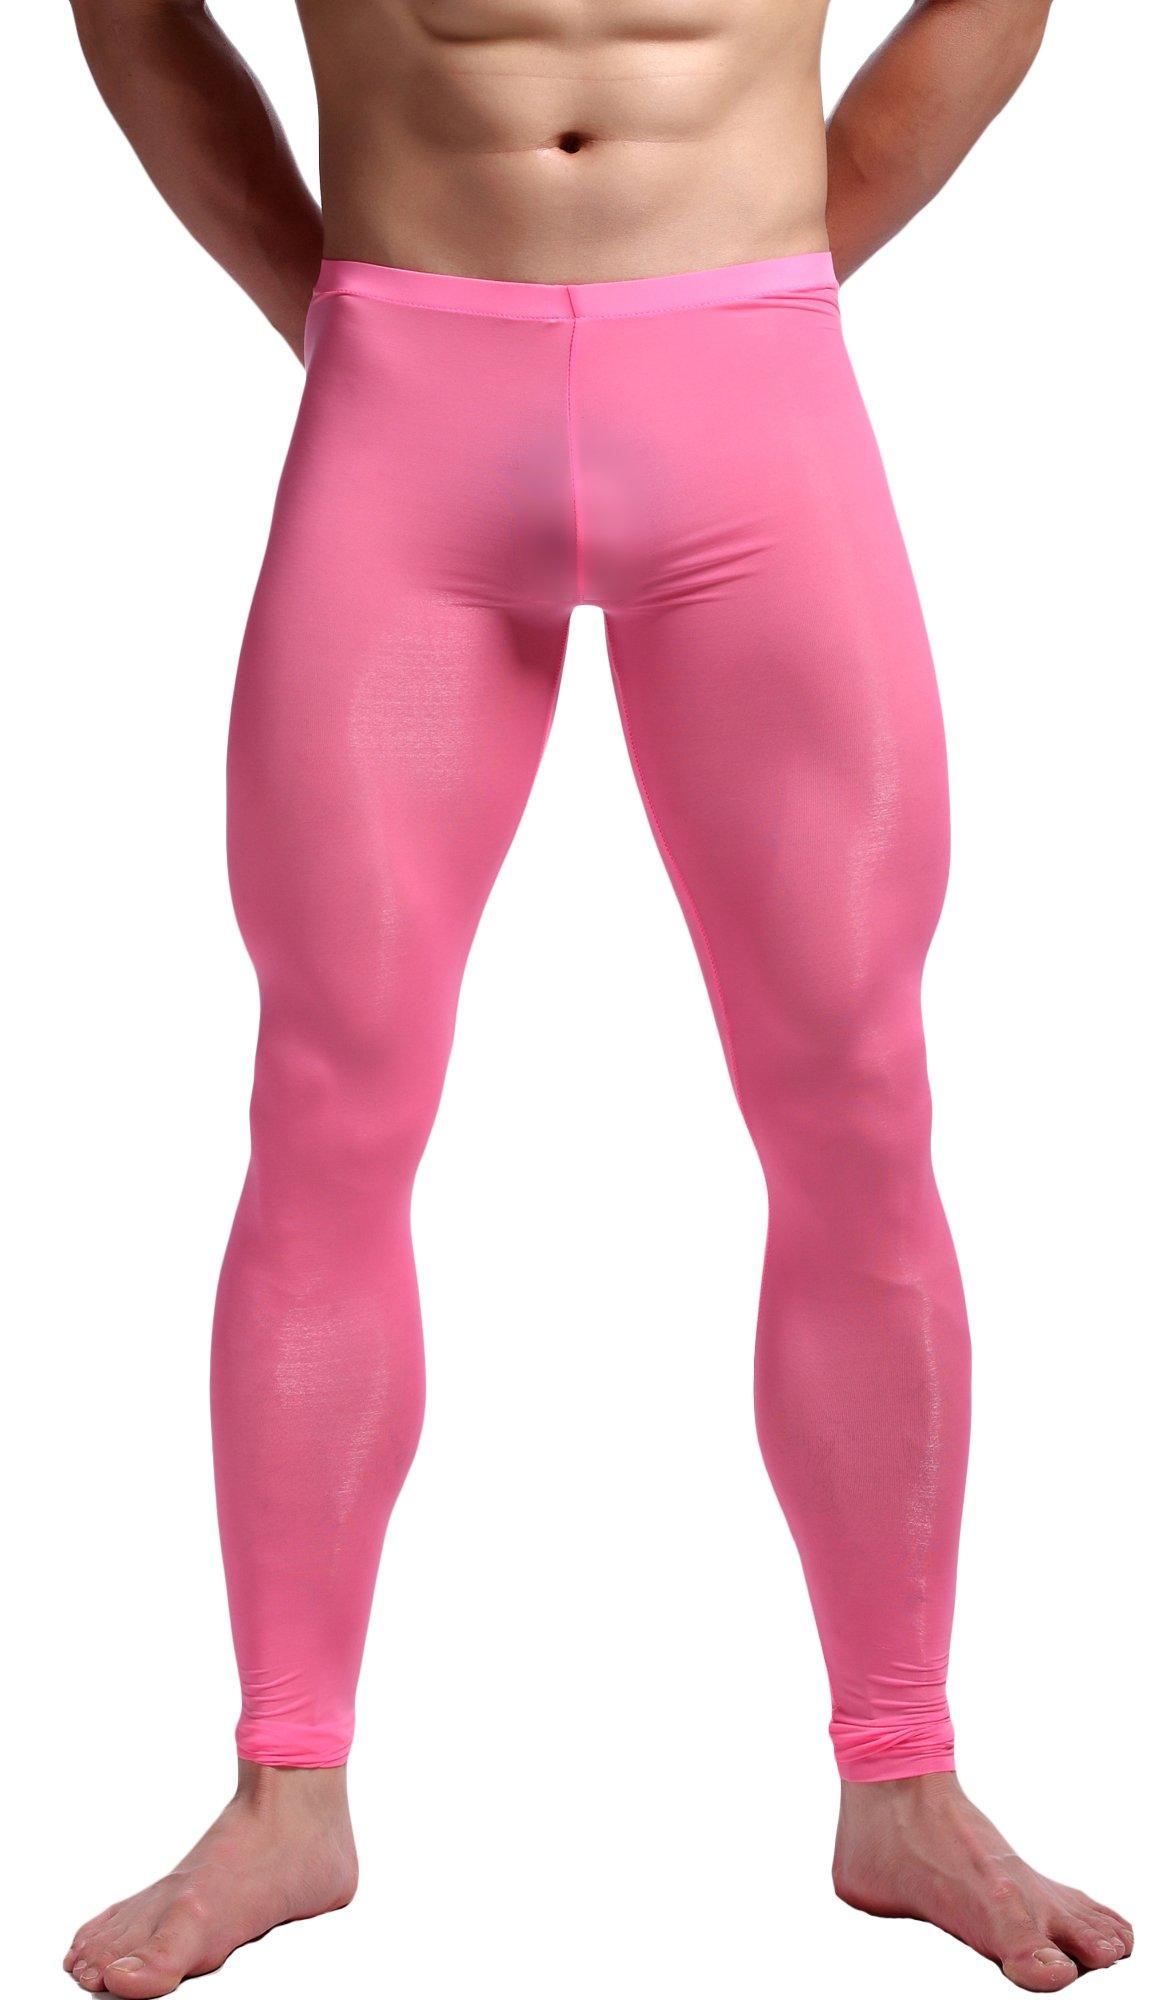 WUAMBO Men's Mesh Long Johns Slim Sexy Legging Tights Pink XL (Waist:32''-35'') by WUAMBO